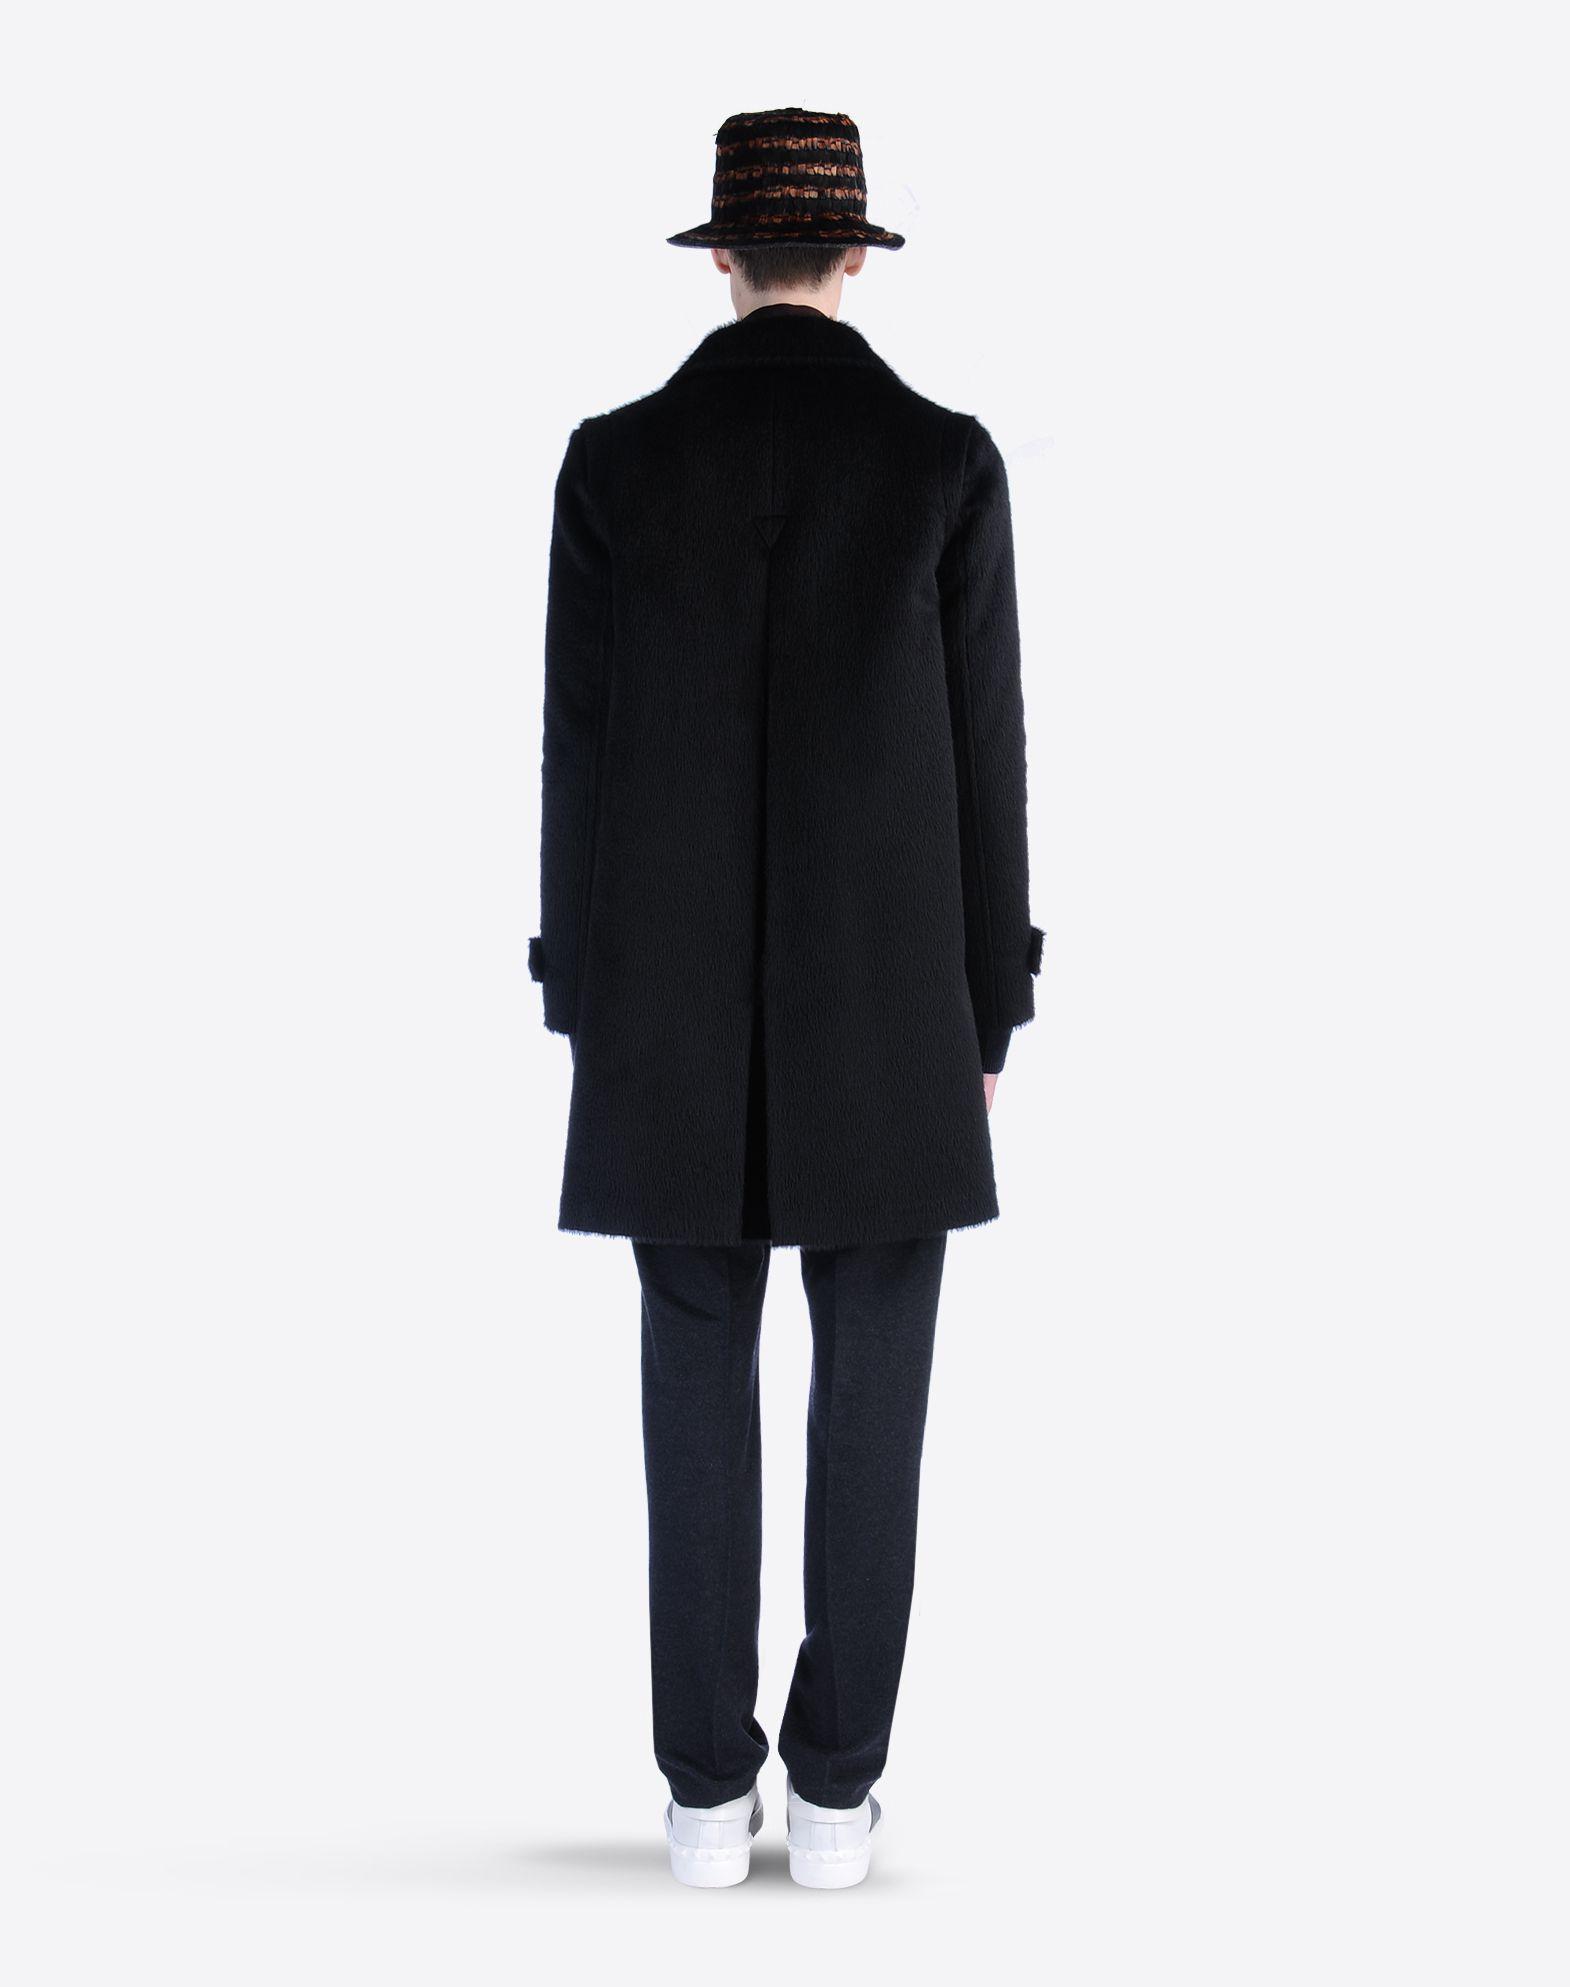 manteau homme valentino,valentino blouson bleu fonc茅 homme,valentino  chaussures soldes,soldes magasin,Valentino Homme a817bb6bab5